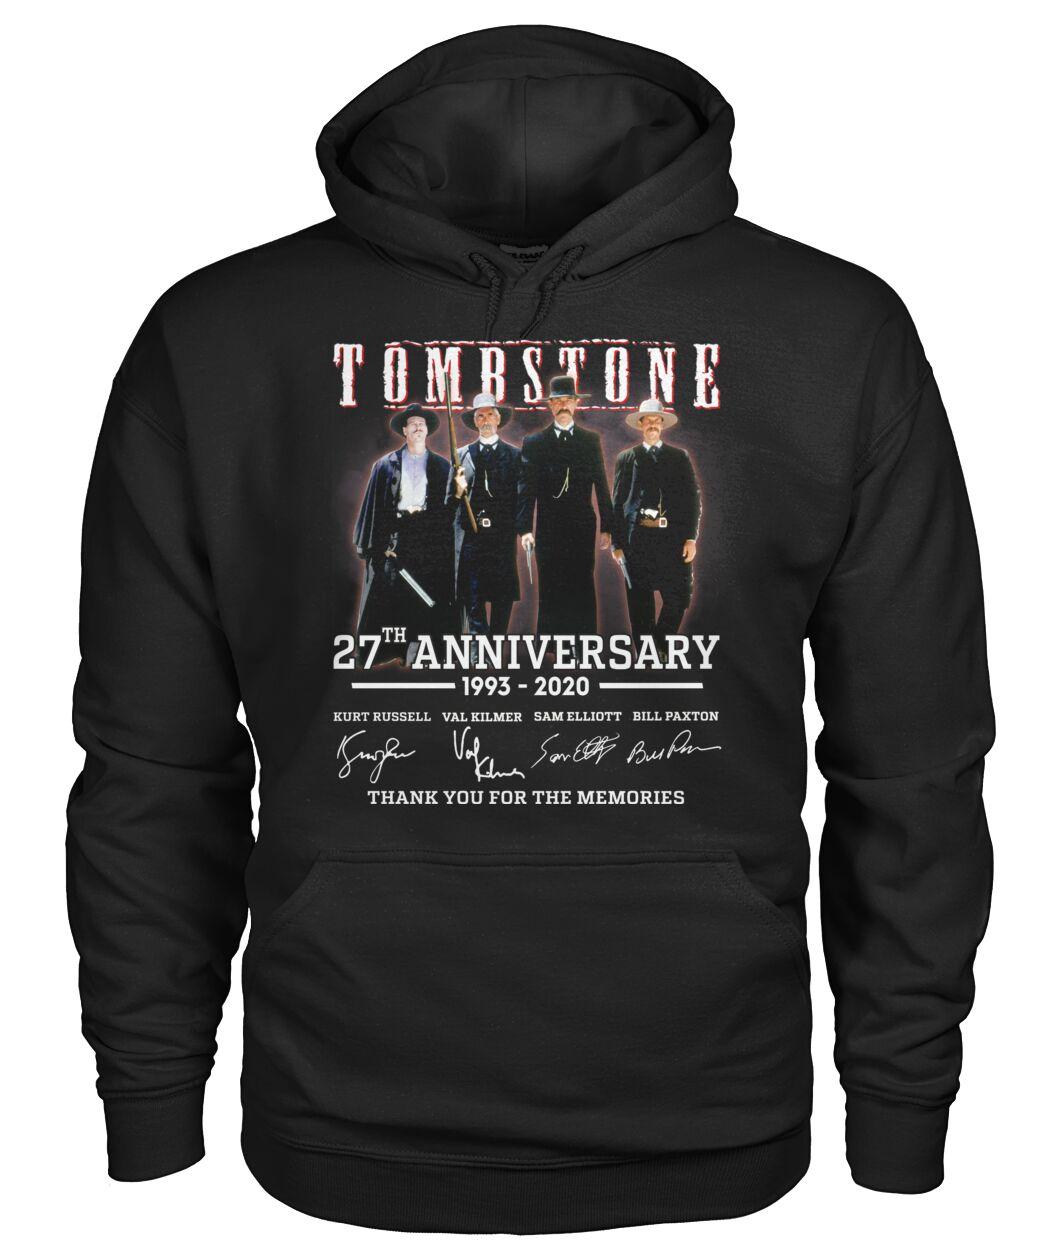 tombstone 27th anniversary signature hoodie